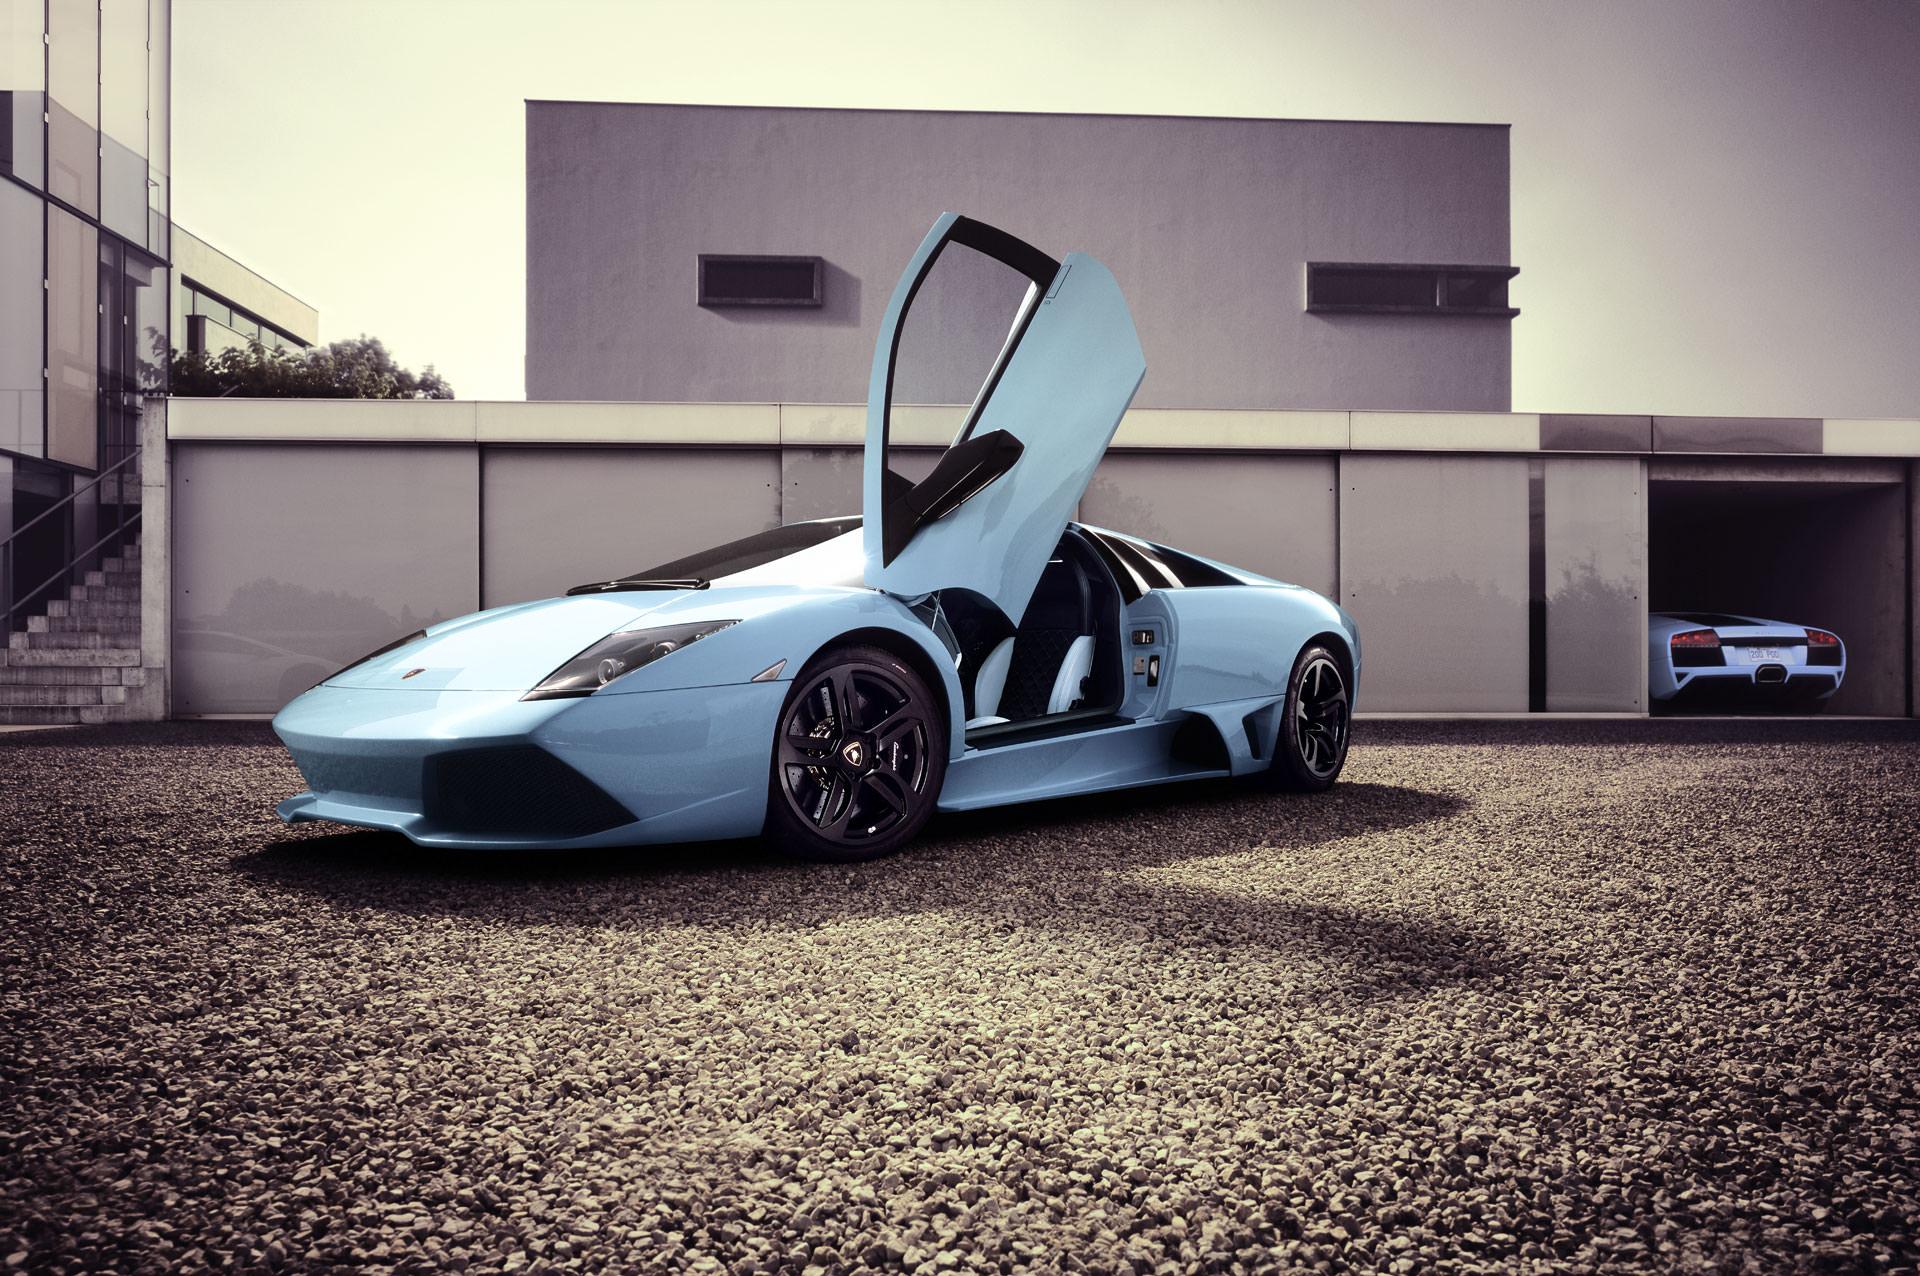 Lamborghini Murcielago Lp640 Frank Linders Photography